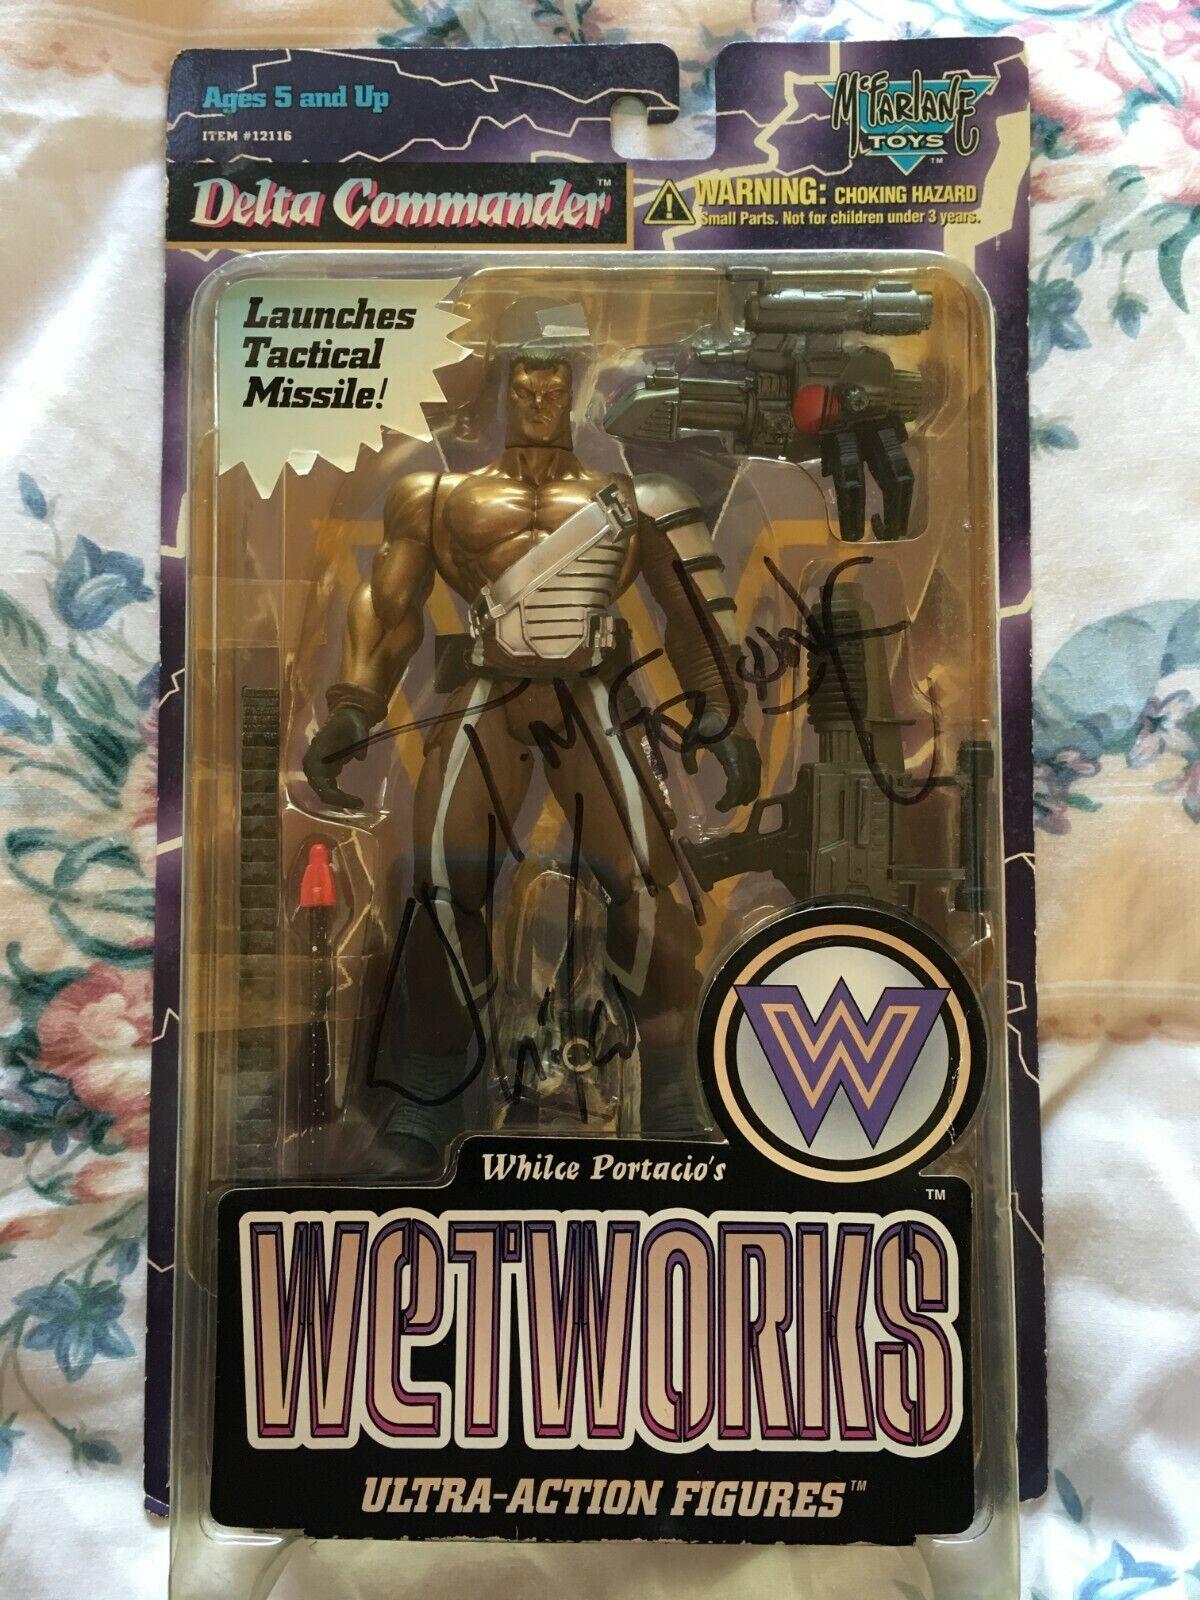 McFarlane Toys Wetworks Delta Commander figure MOC Todd Mcfarlane Autograph